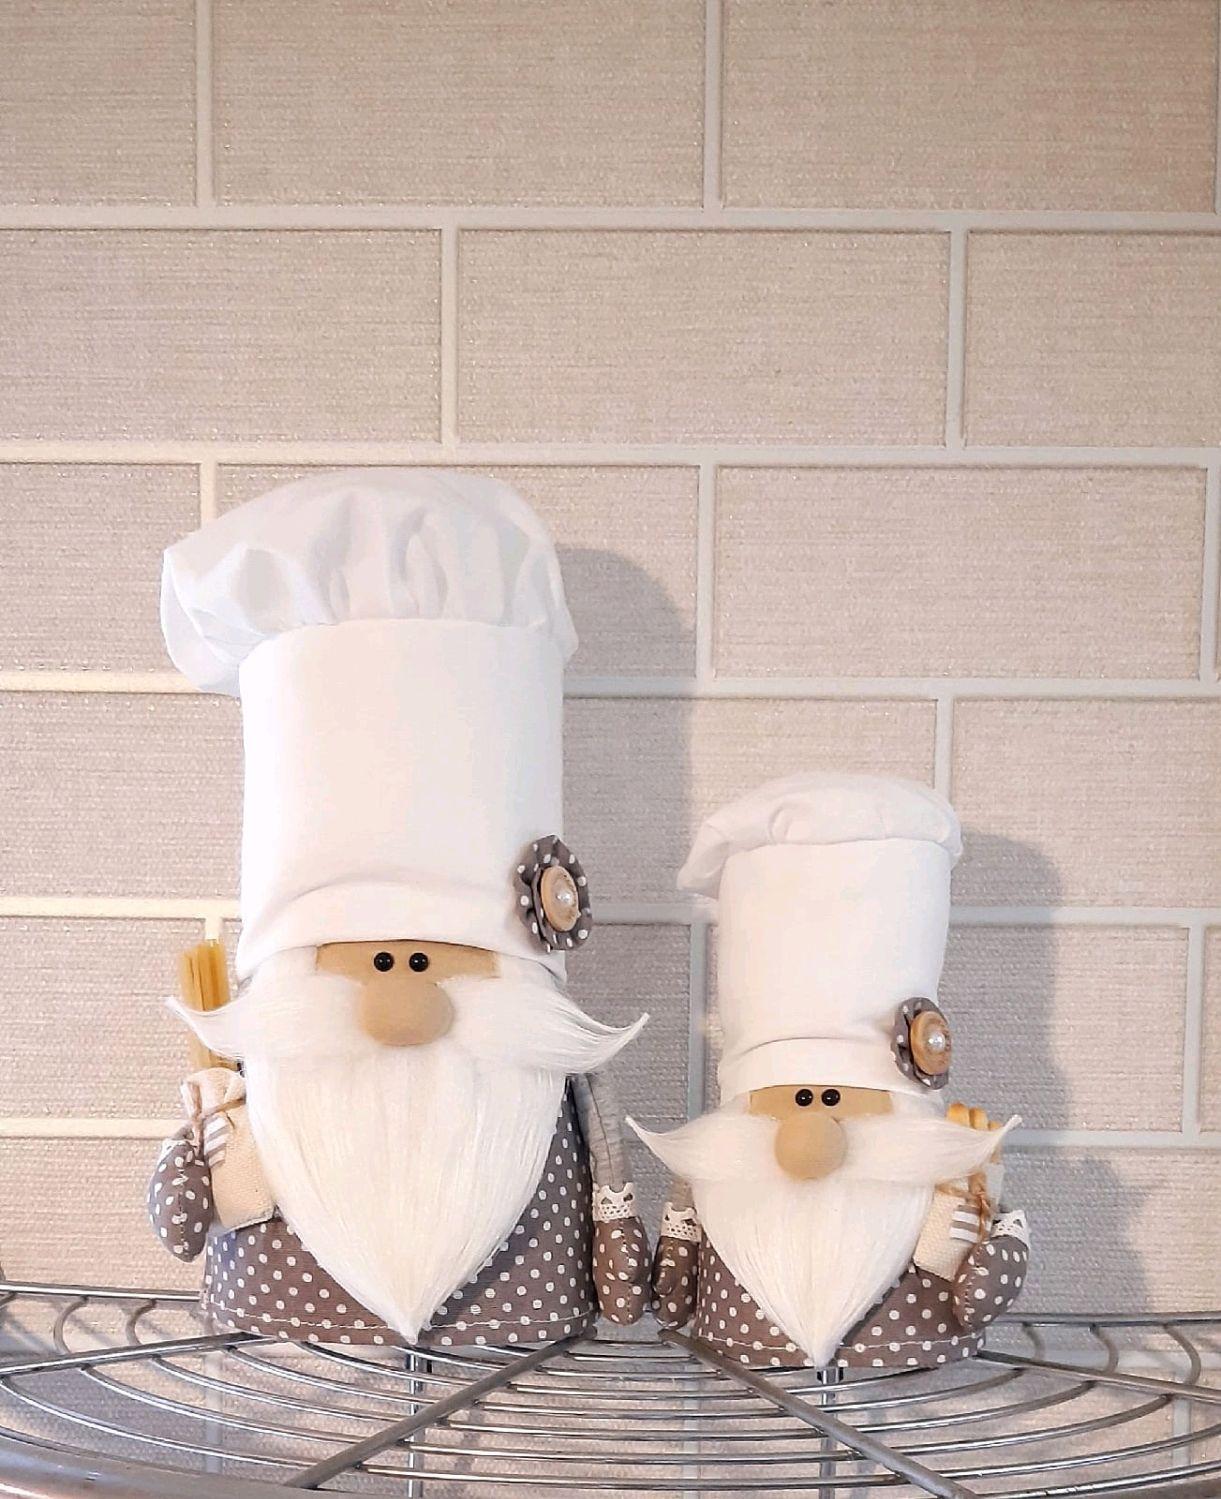 Повар с поварёнком!, Декор в стиле Тильда, Тула,  Фото №1